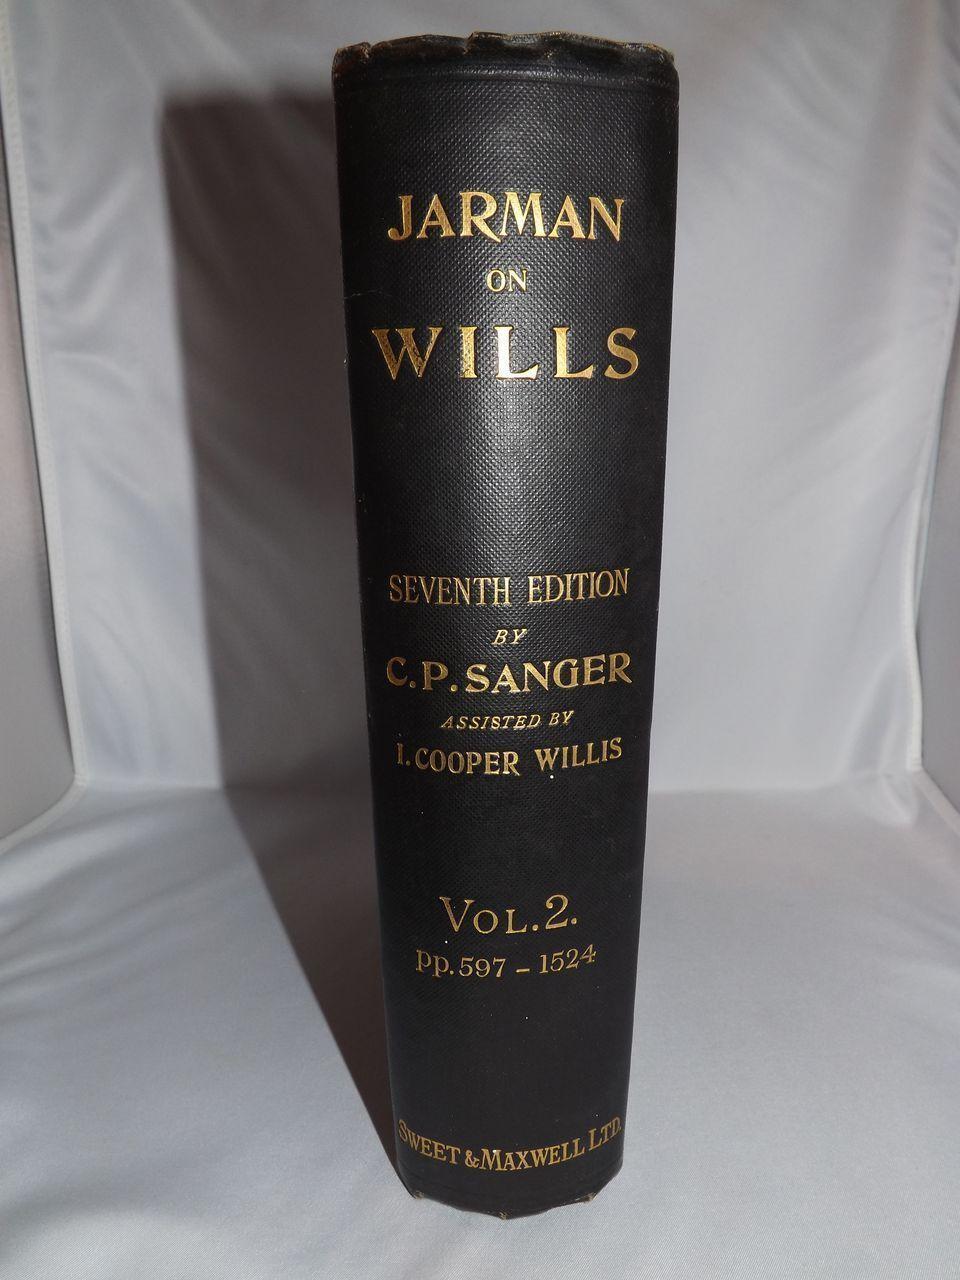 Vintage Law Book - Jarman on Wills Seventh Edition Vol. 2